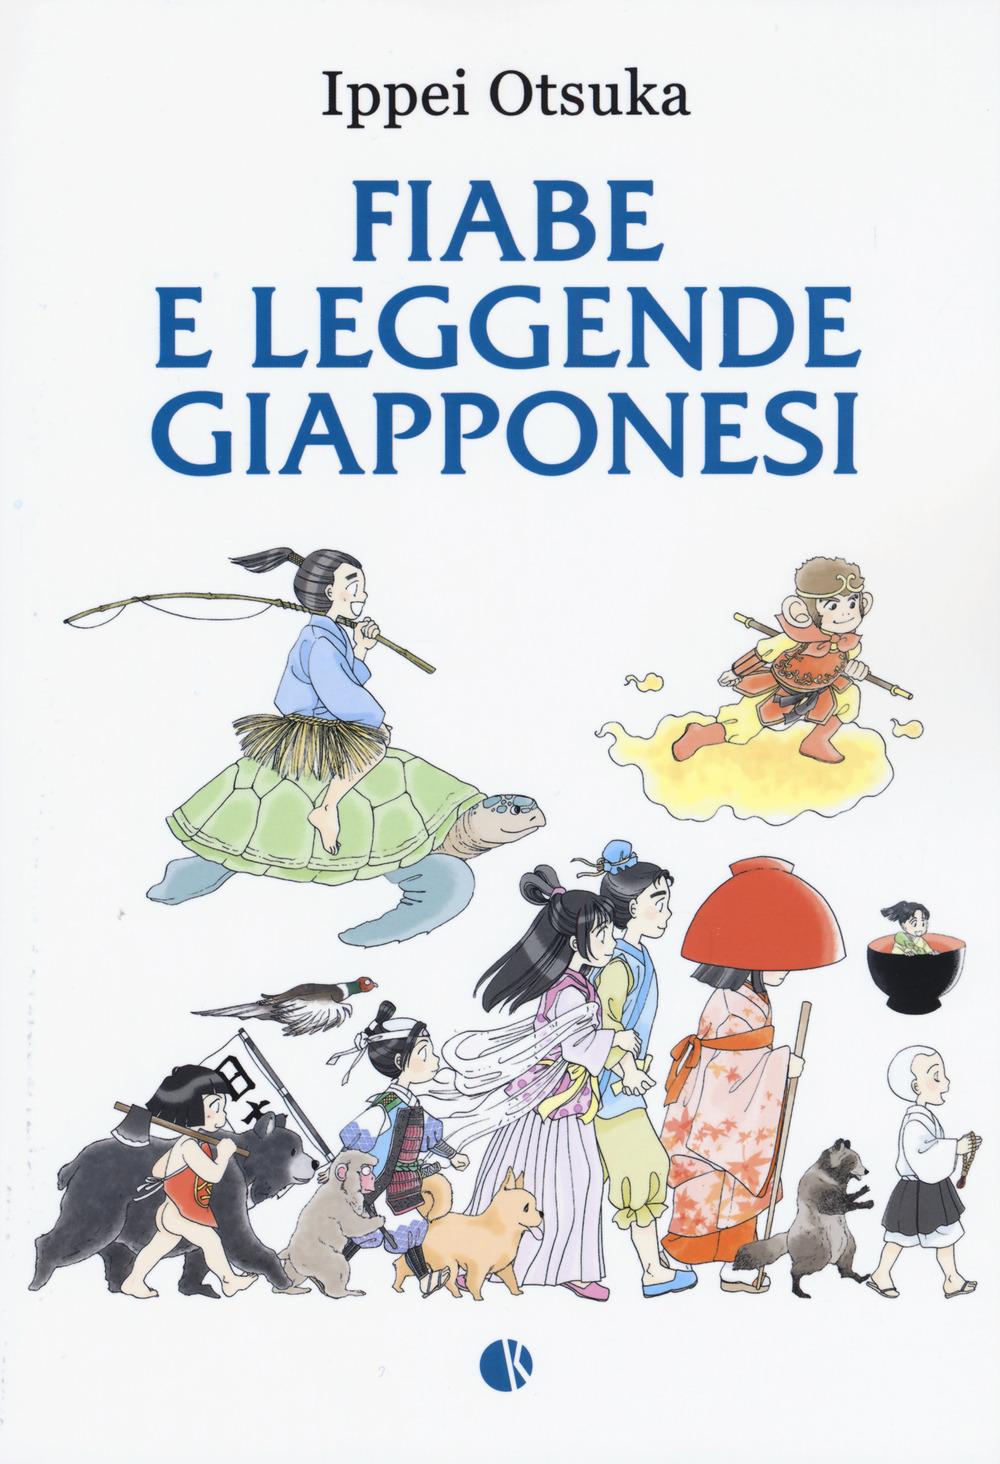 FIABE E LEGGENDE GIAPPONESI - Otsuka Ippei - 9788885457263